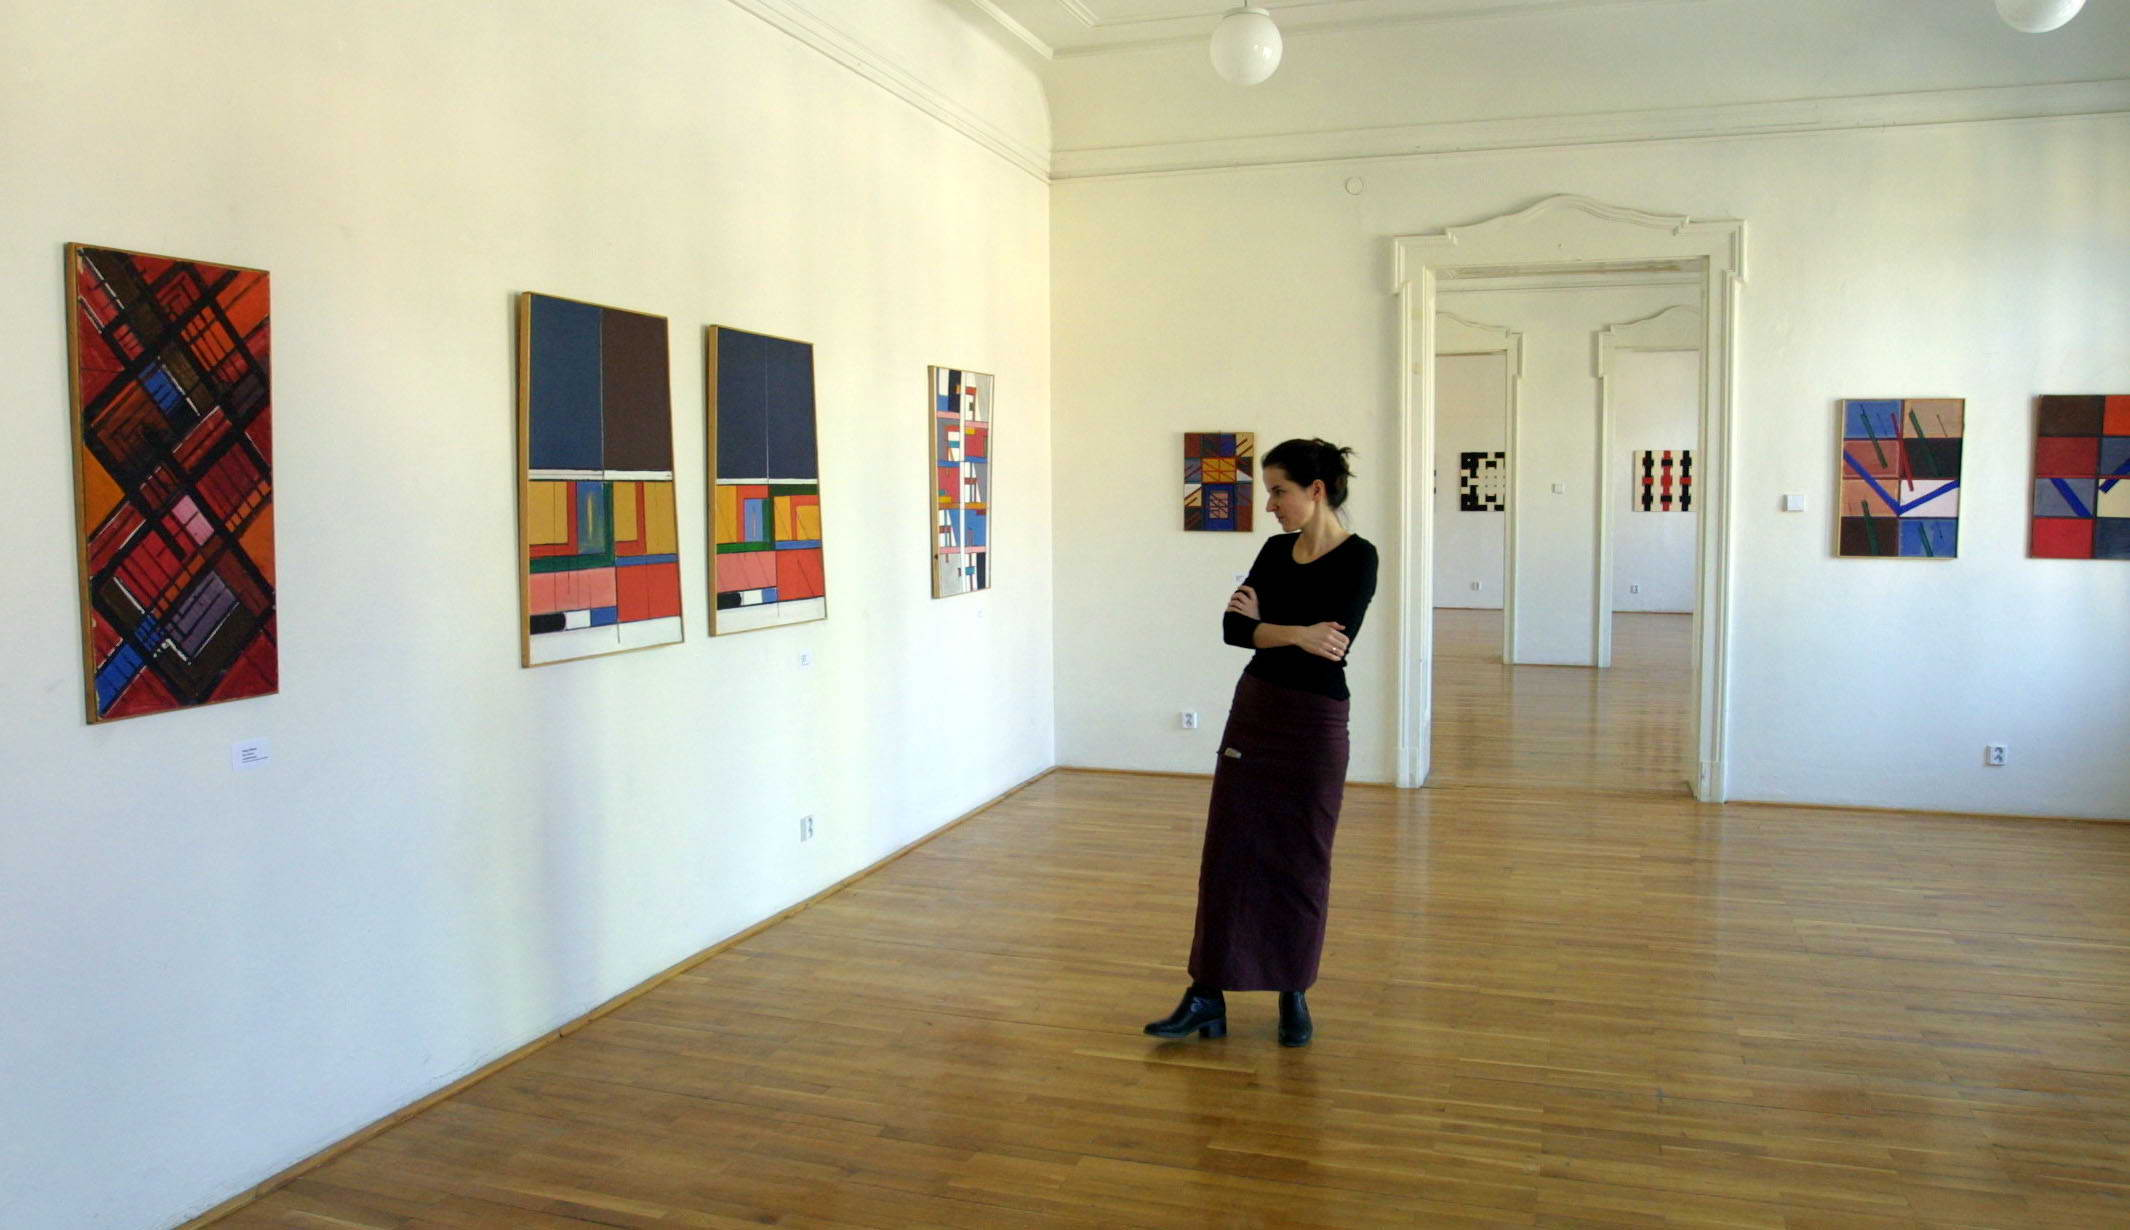 galeria pilladas mujeres exitadas